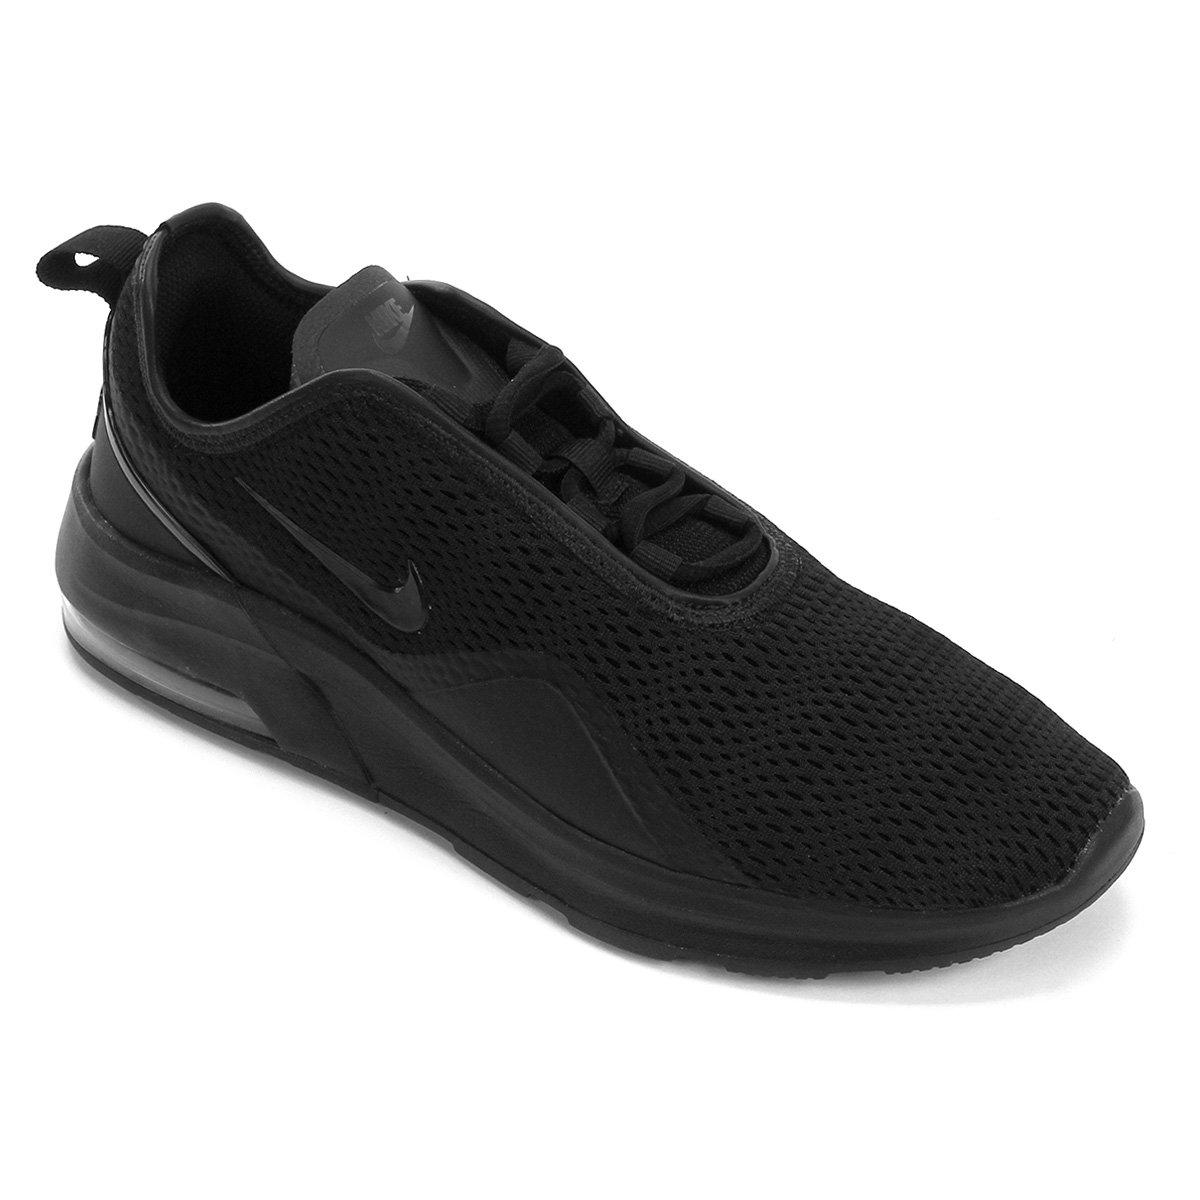 Tênis Nike Air Max 1 Ultra 2.0 Essential Preto Maze